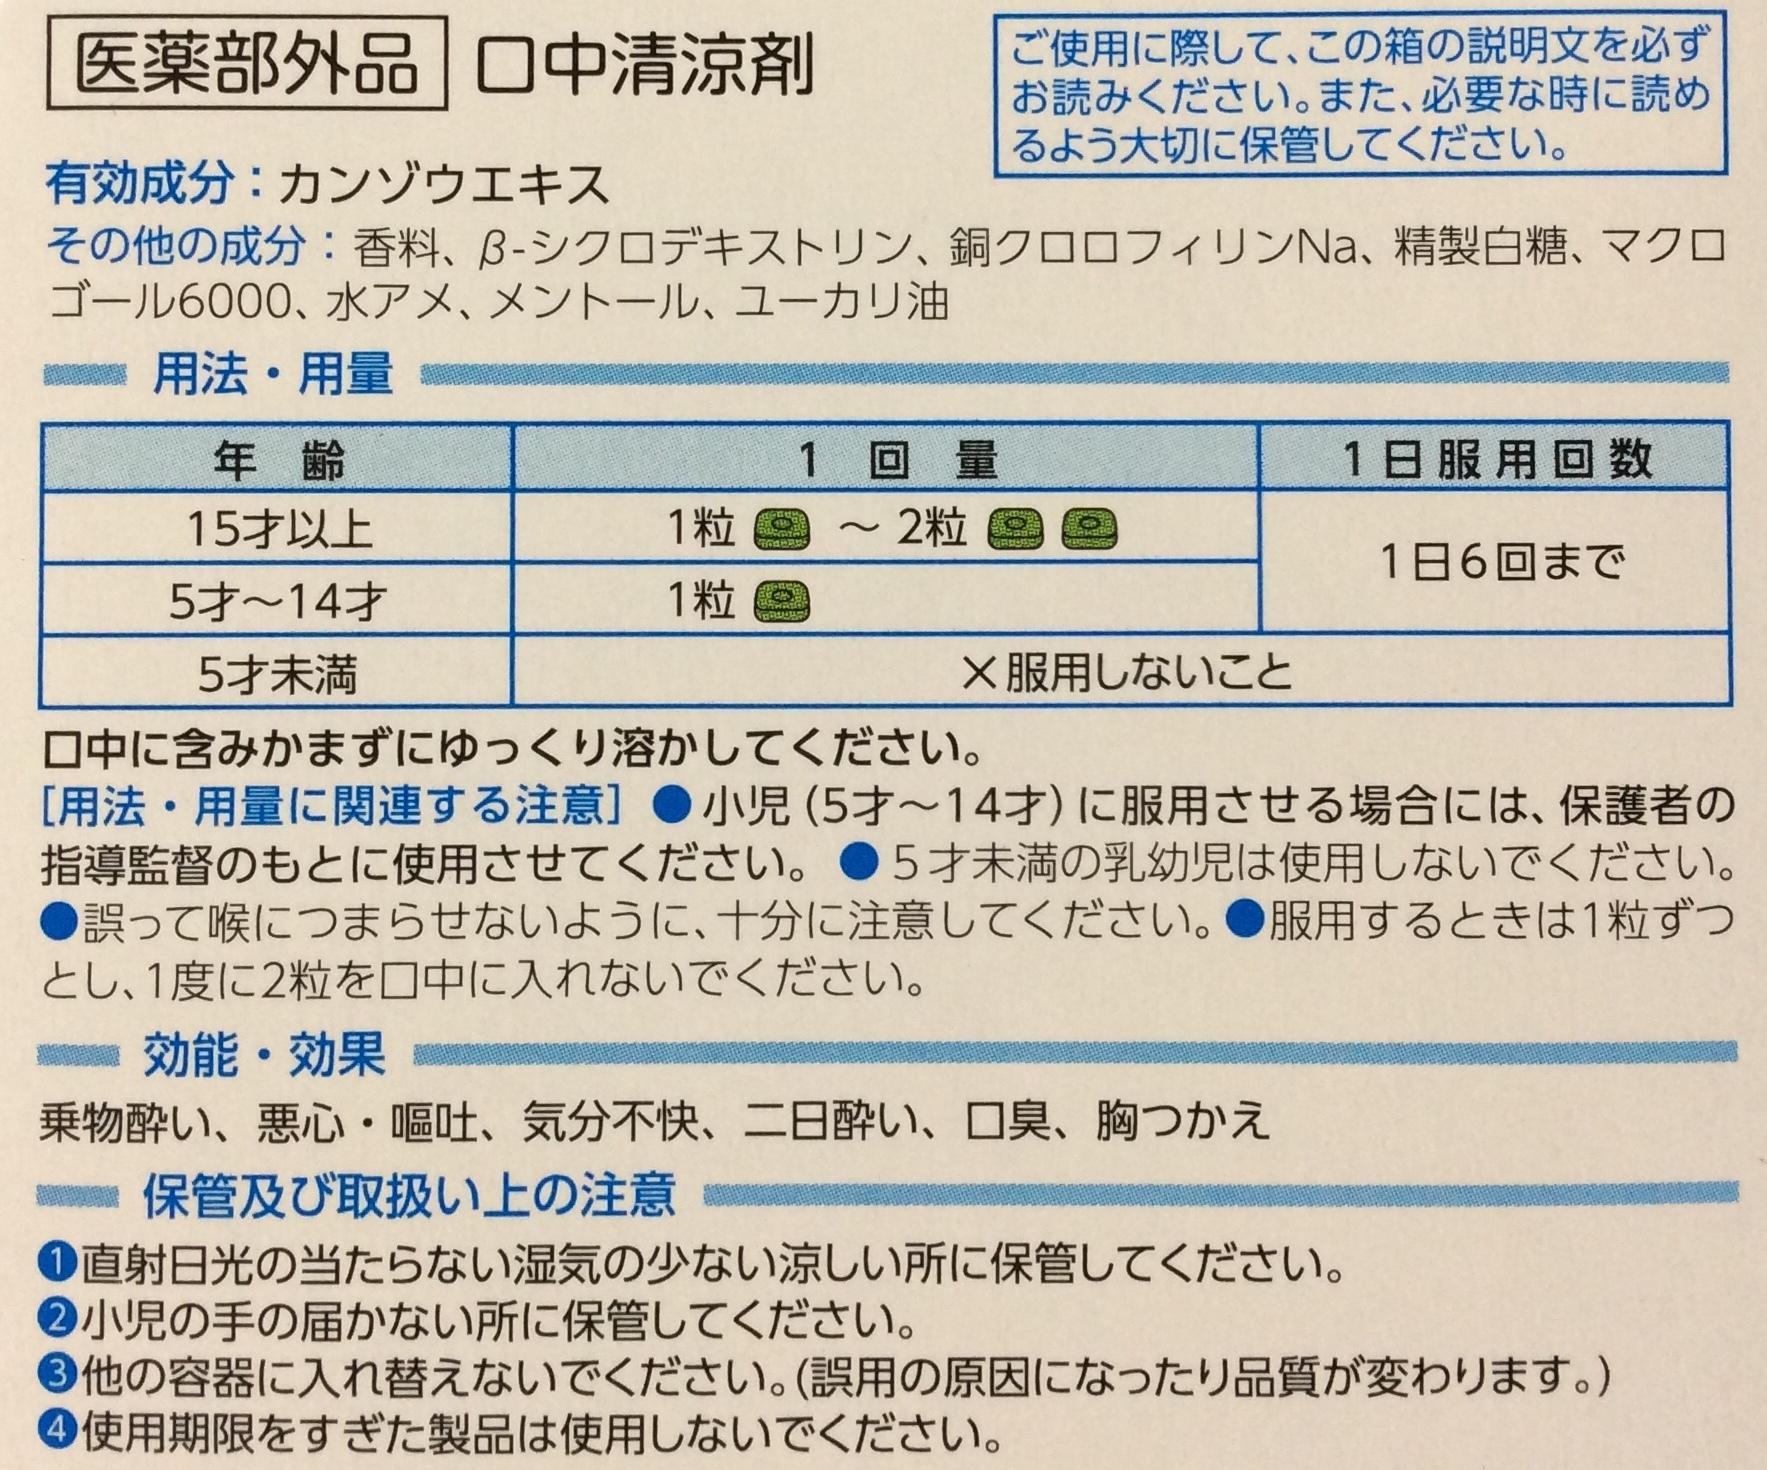 D290AC89-3C43-45AA-A456-CB01B8CC02C0.jpeg